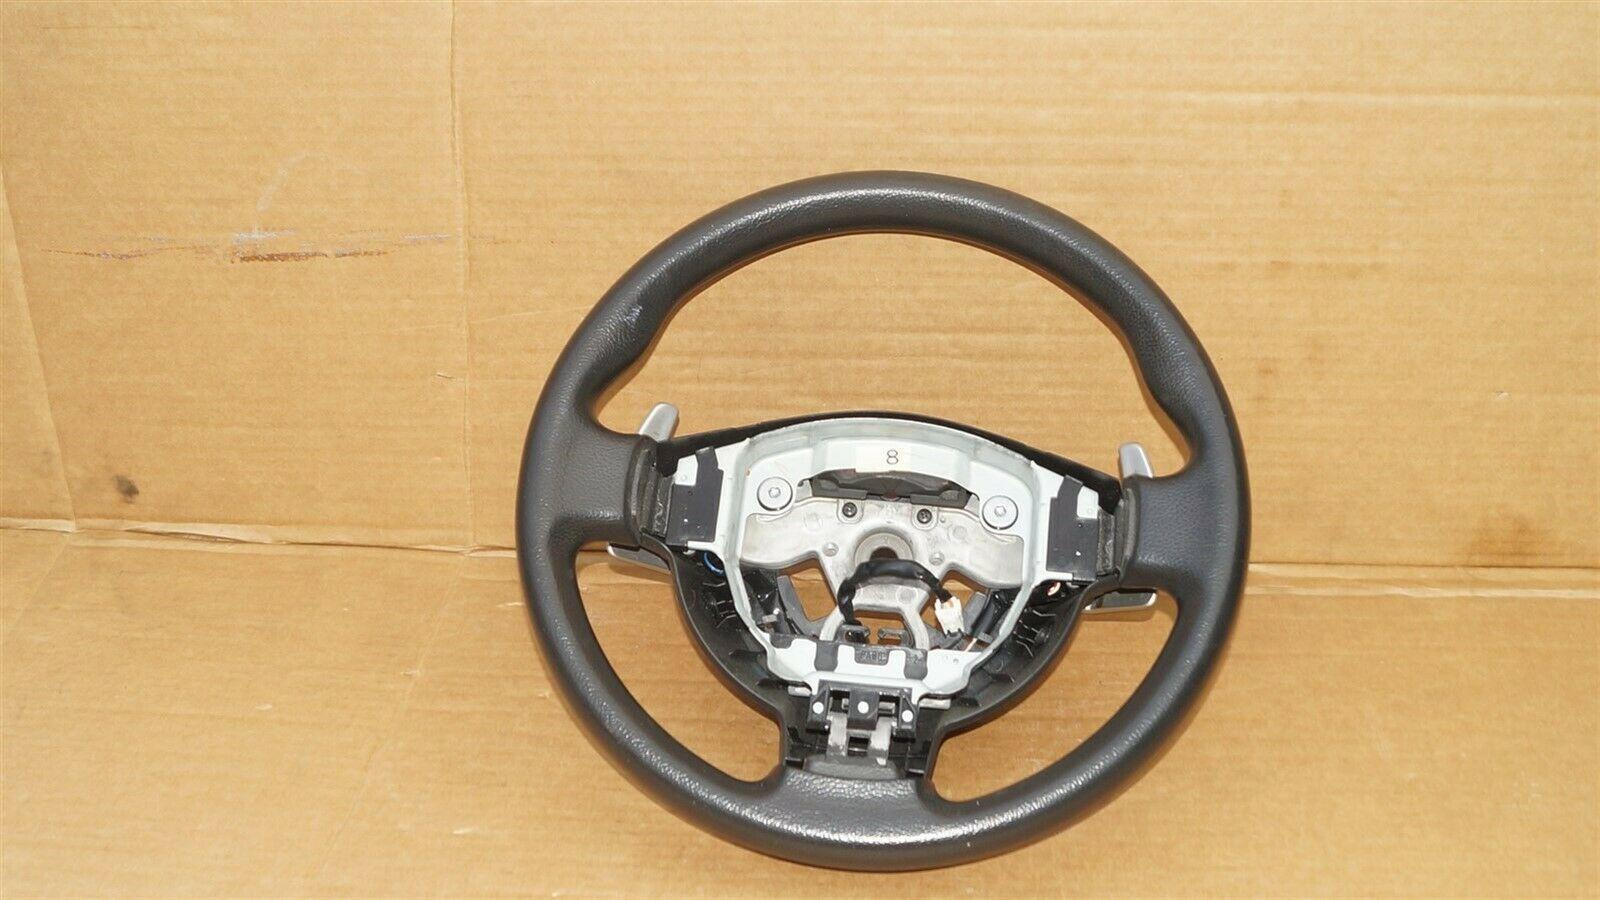 08-13 Nissan Rogue Krom Steering Wheel W/ Shift Paddles